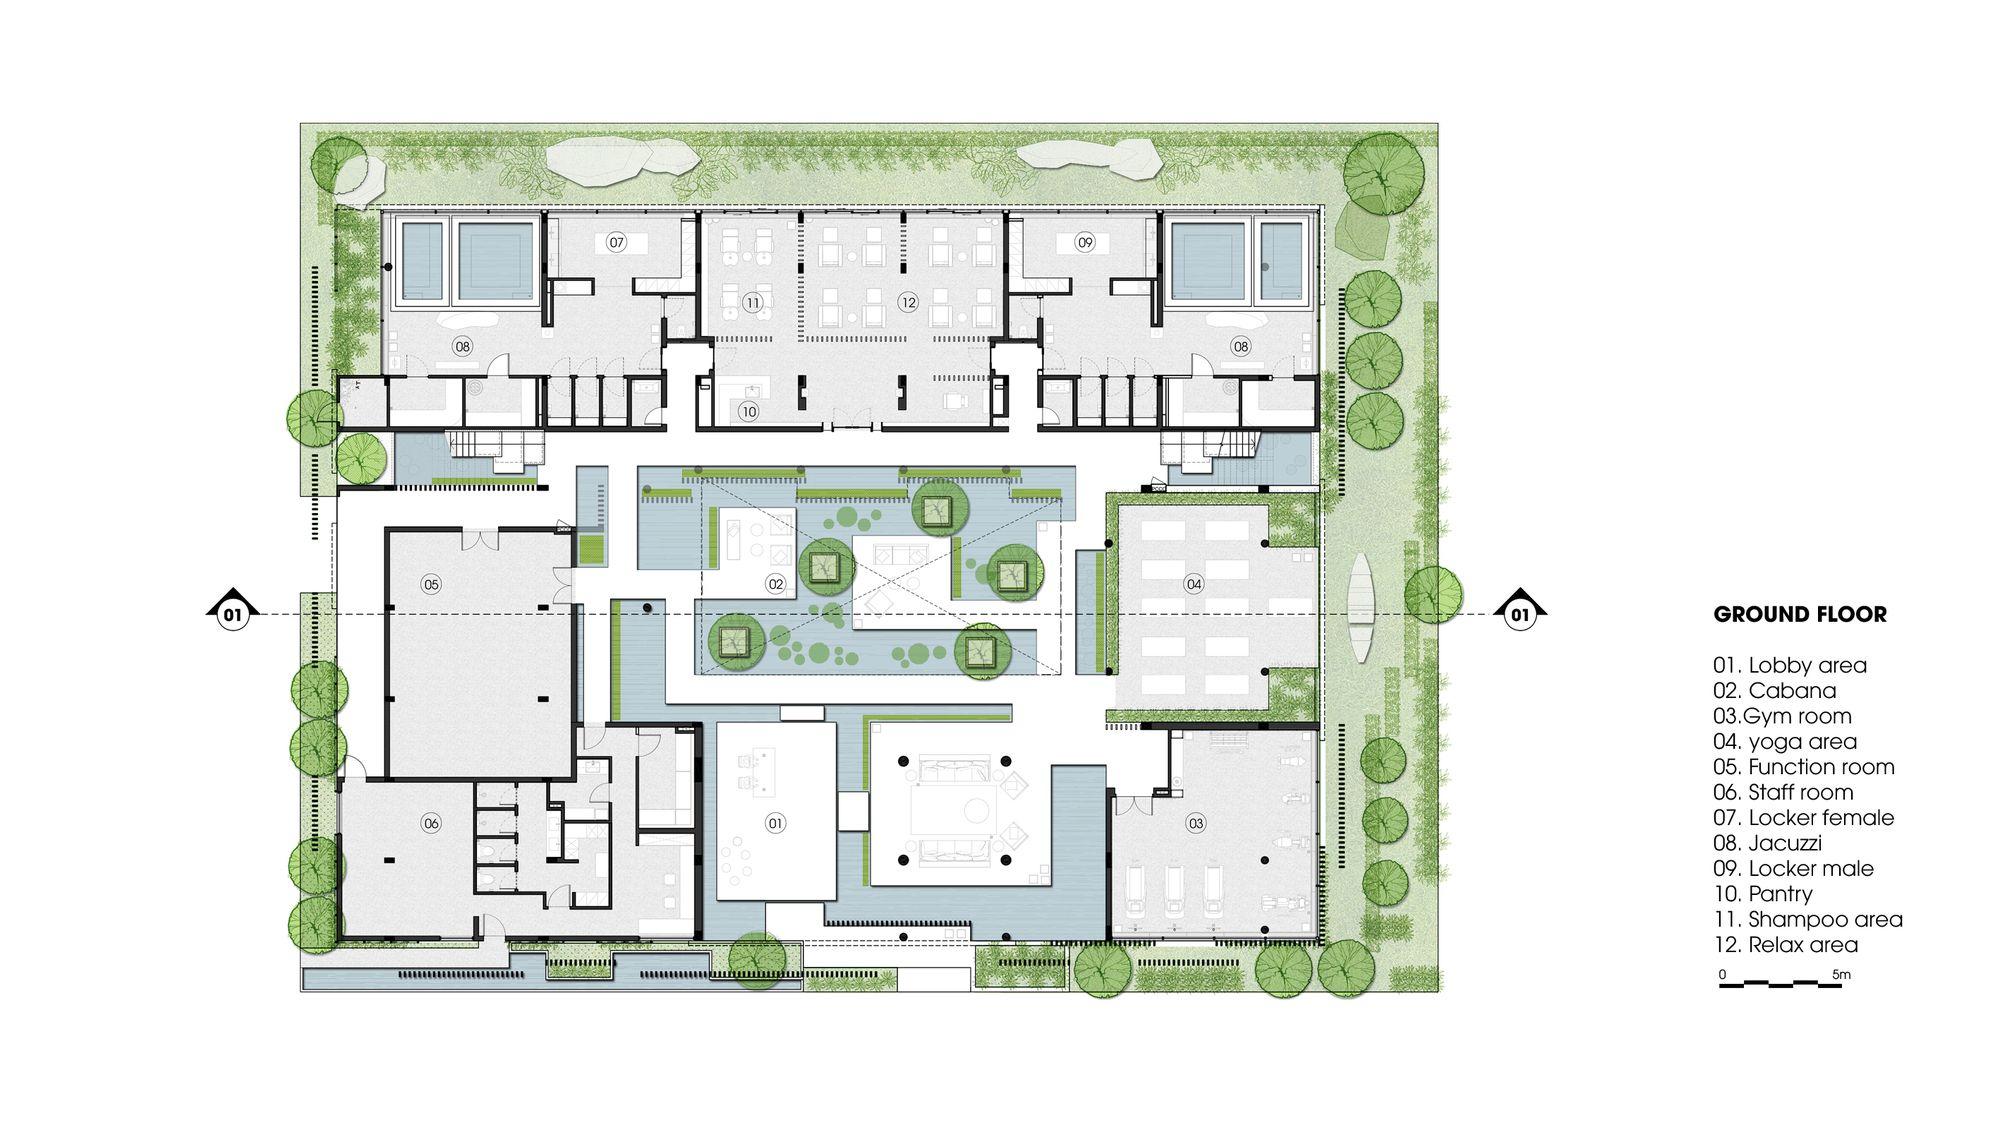 Gallery Of Naman Spa Mia Design Studio 18 Green